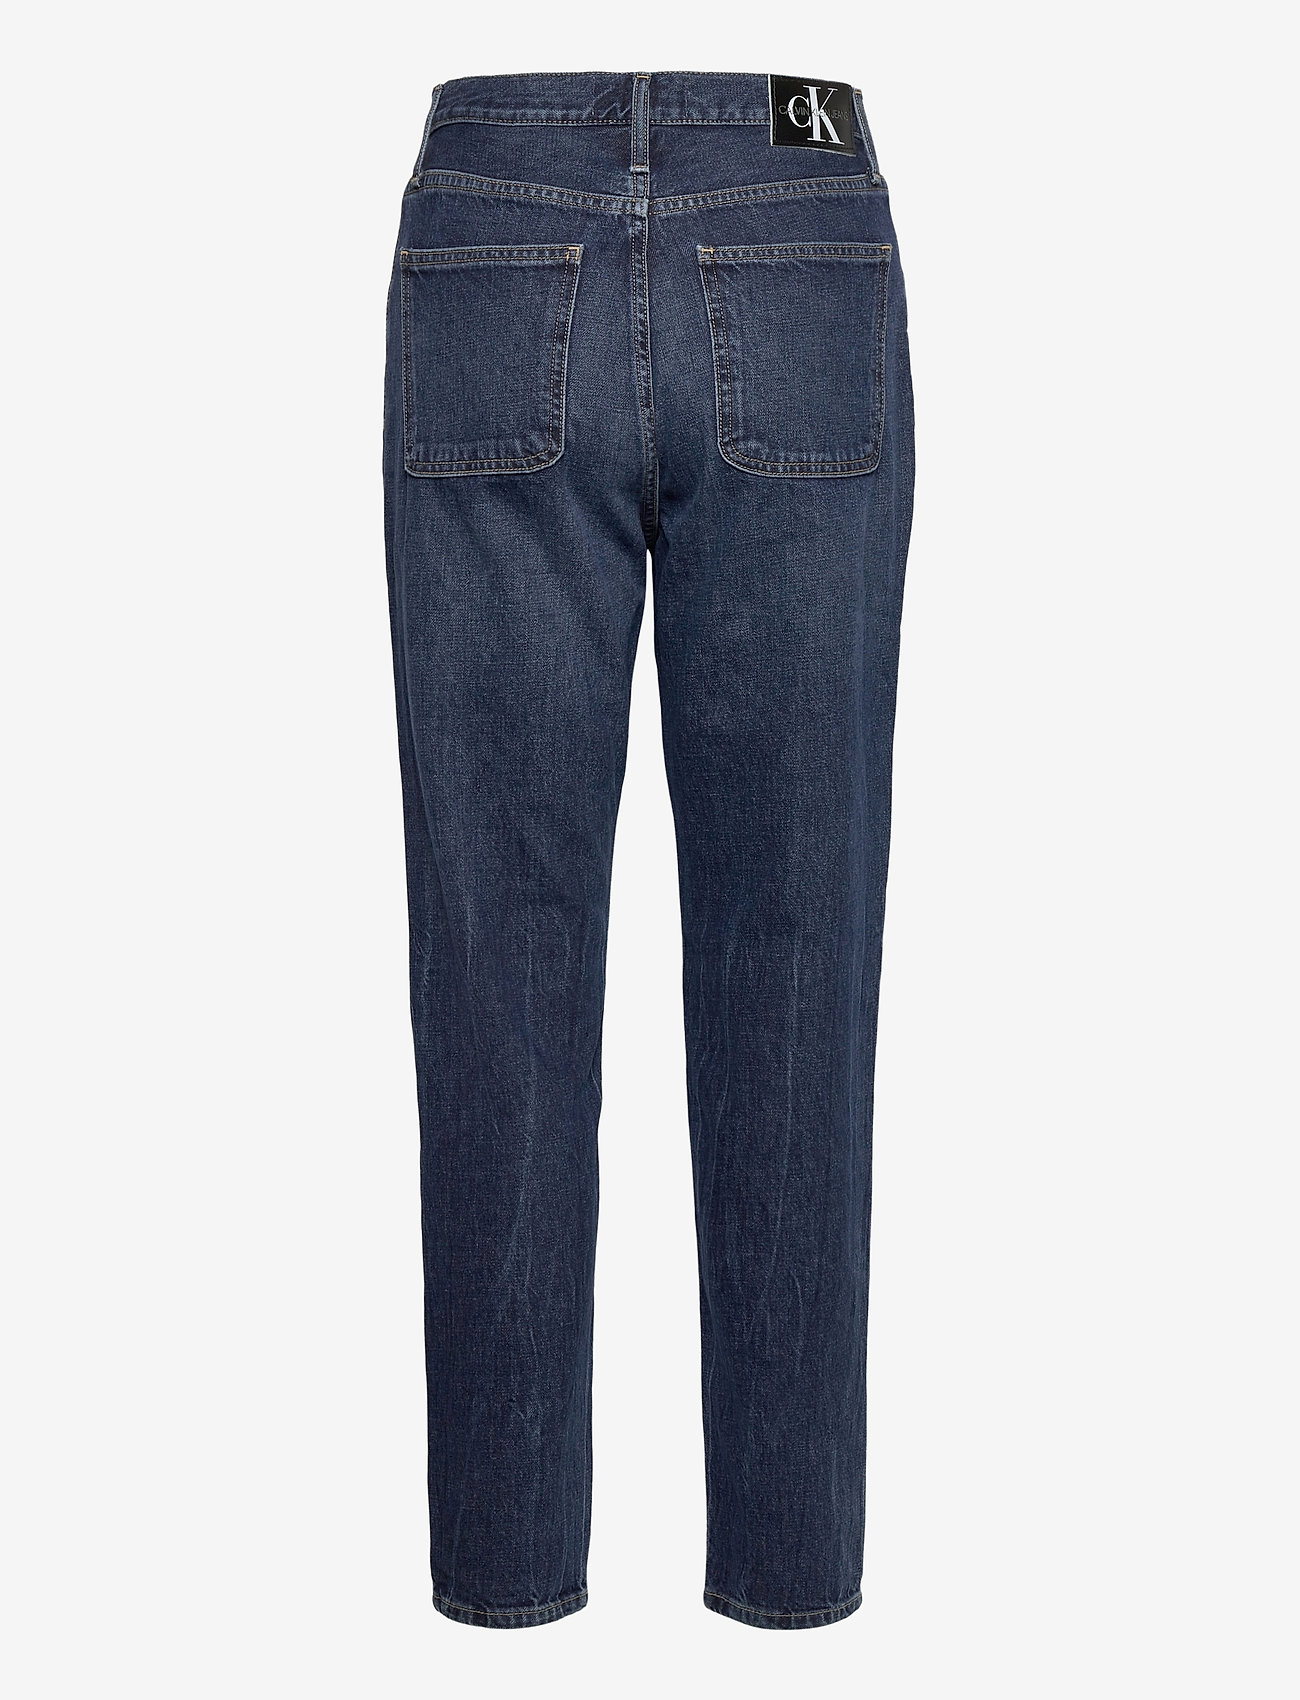 Calvin Klein Jeans - MOM JEAN - straight jeans - bb139 - dark blue utility - 1